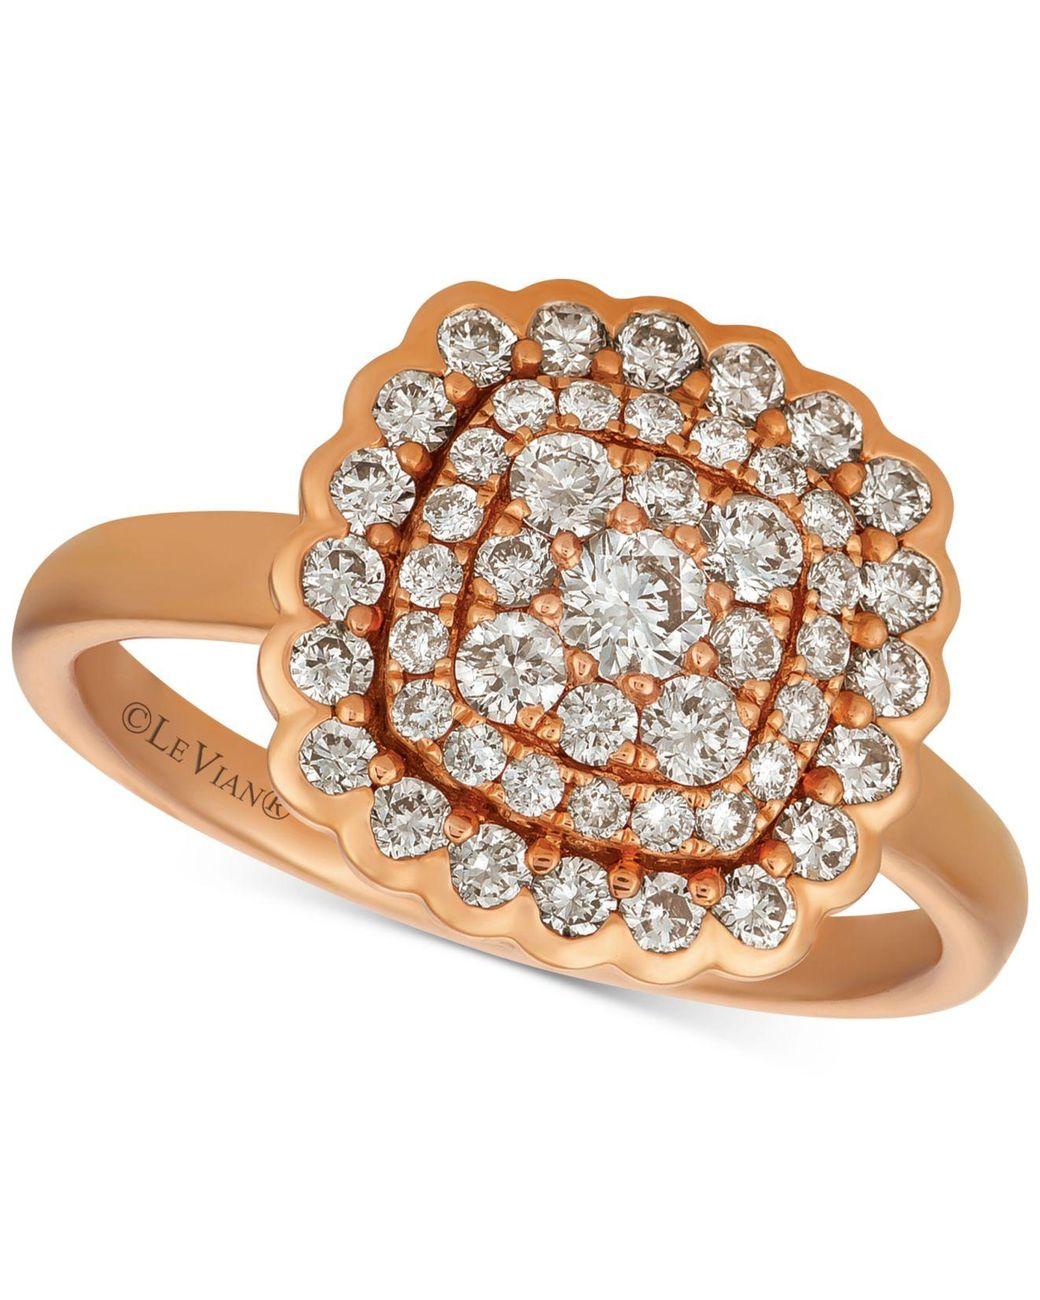 Le Vian Creme Brulee® Nude Diamond Chevron Statement Ring